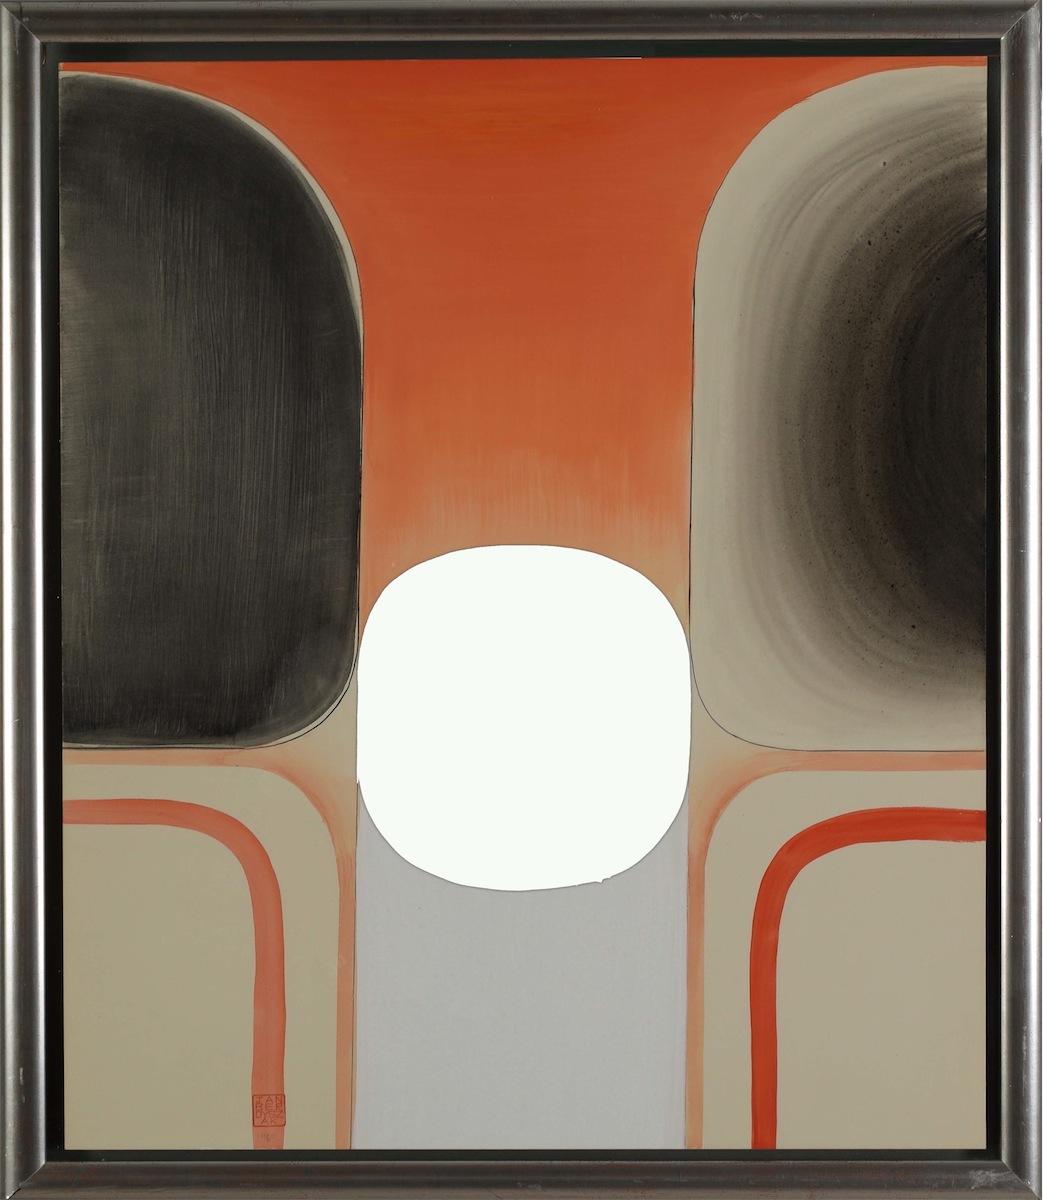 Signum II, 1969